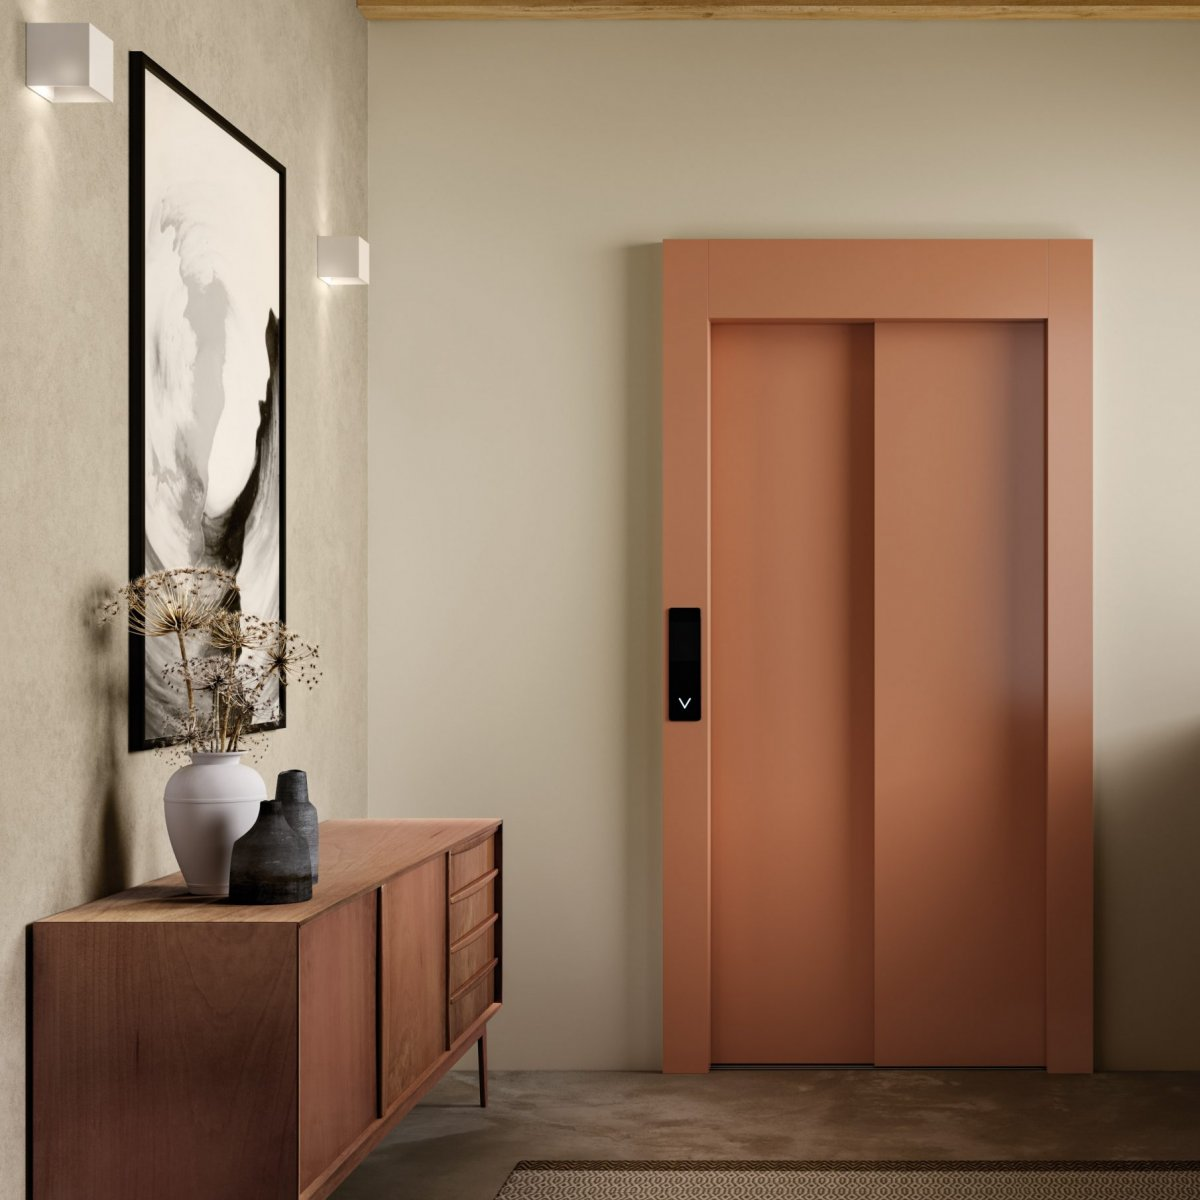 Home Lift | Simplex Elevators Gallery Image 12